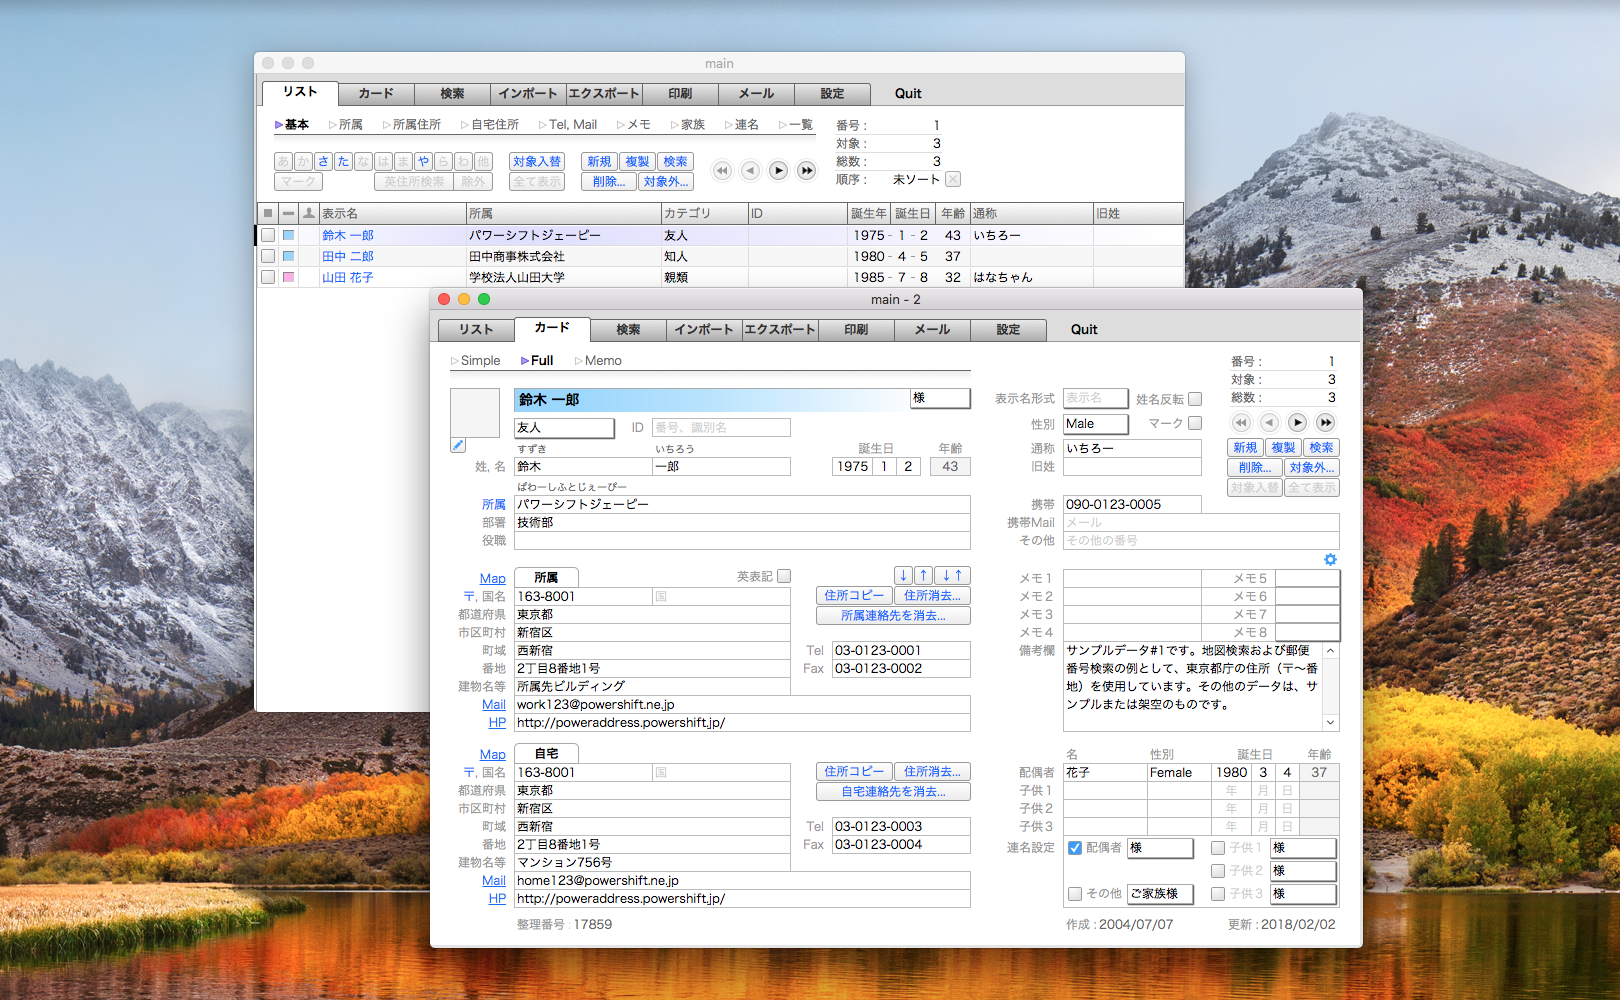 macOS での起動例